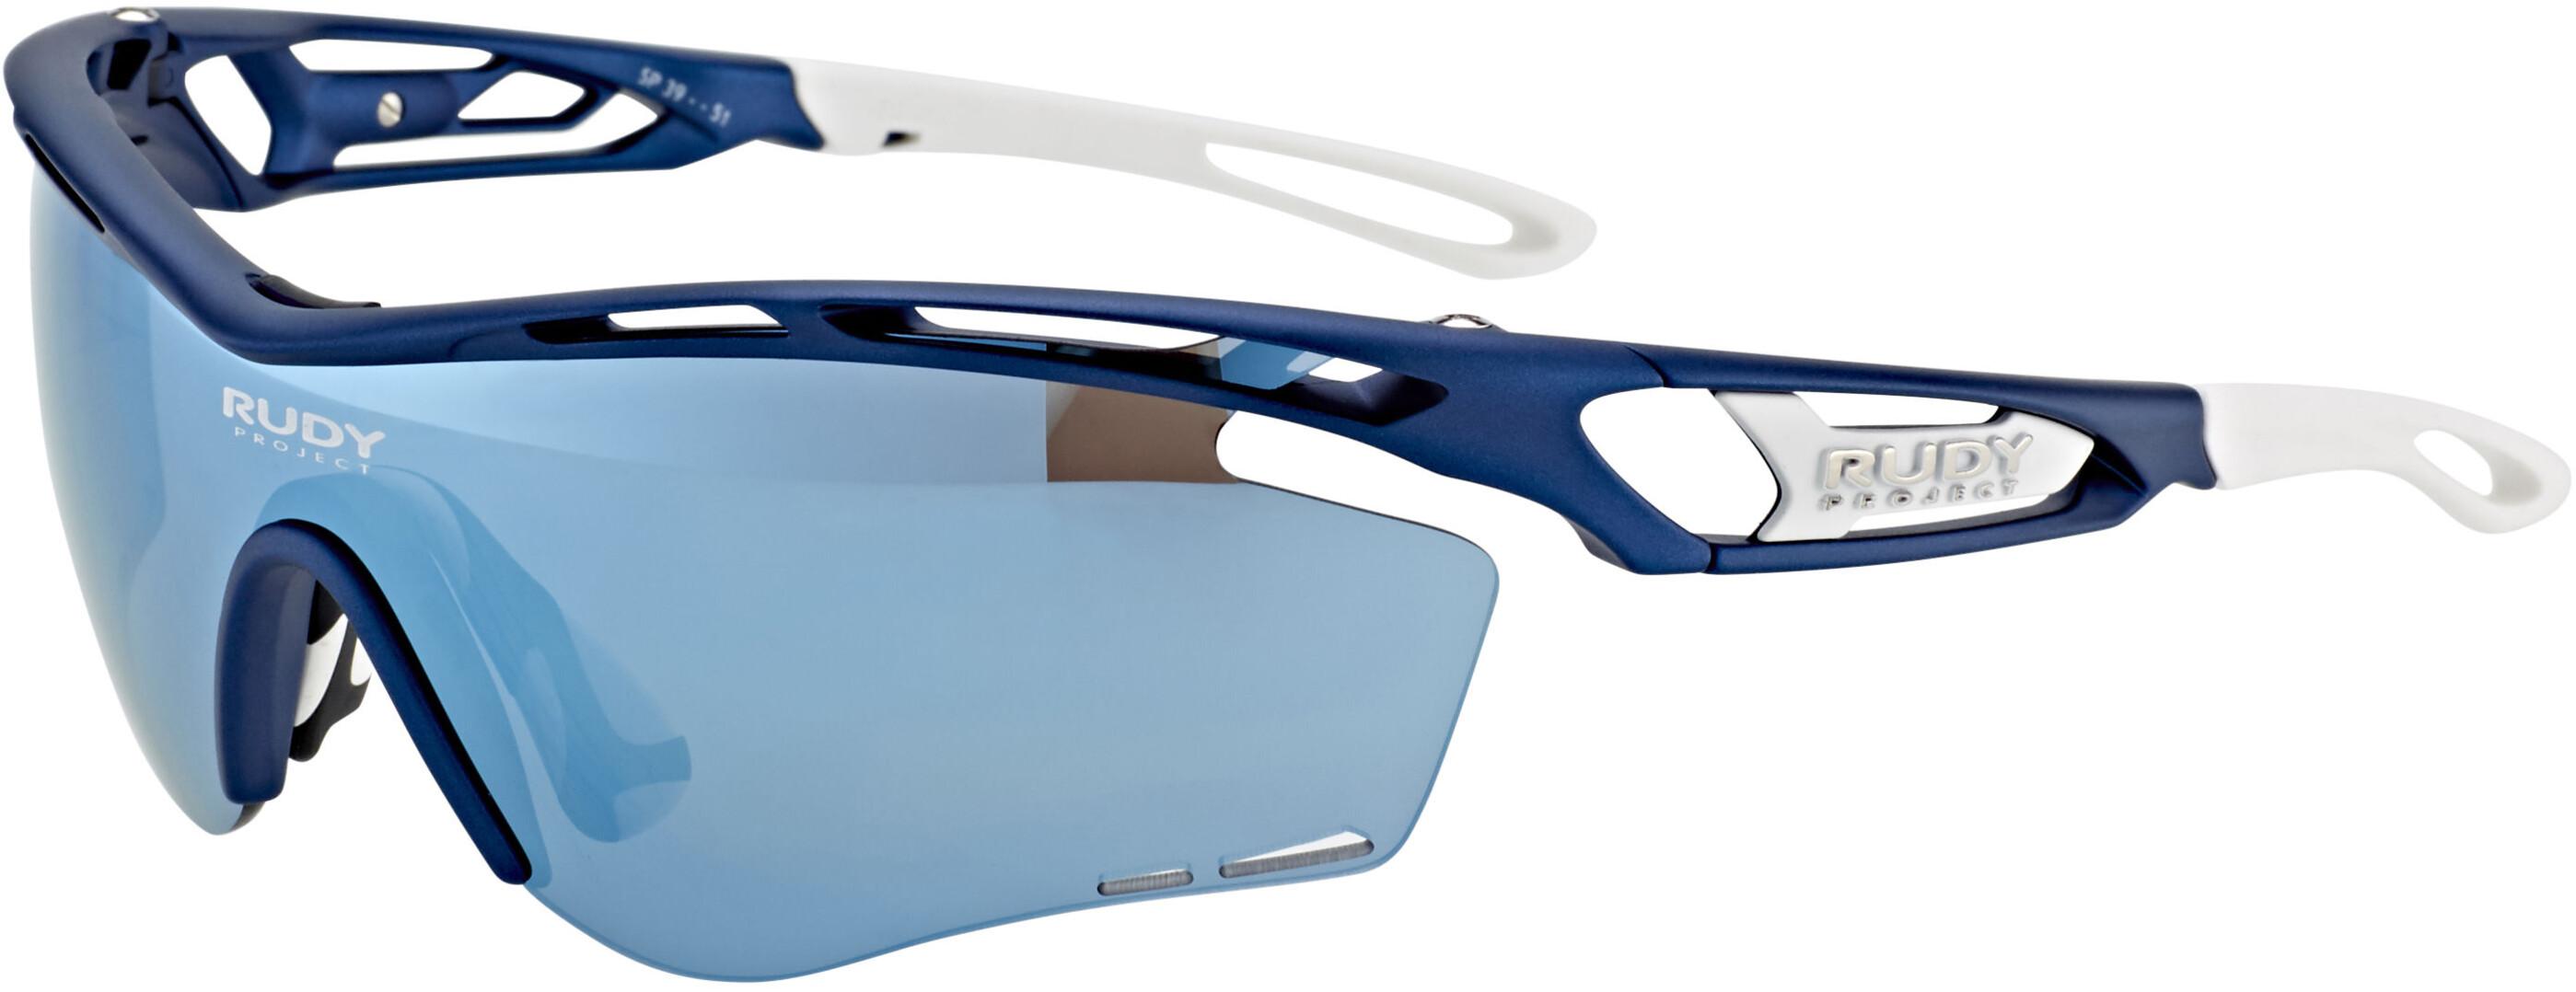 503e513422 Rudy Project Tralyx Bike Glasses blue white at Bikester.co.uk